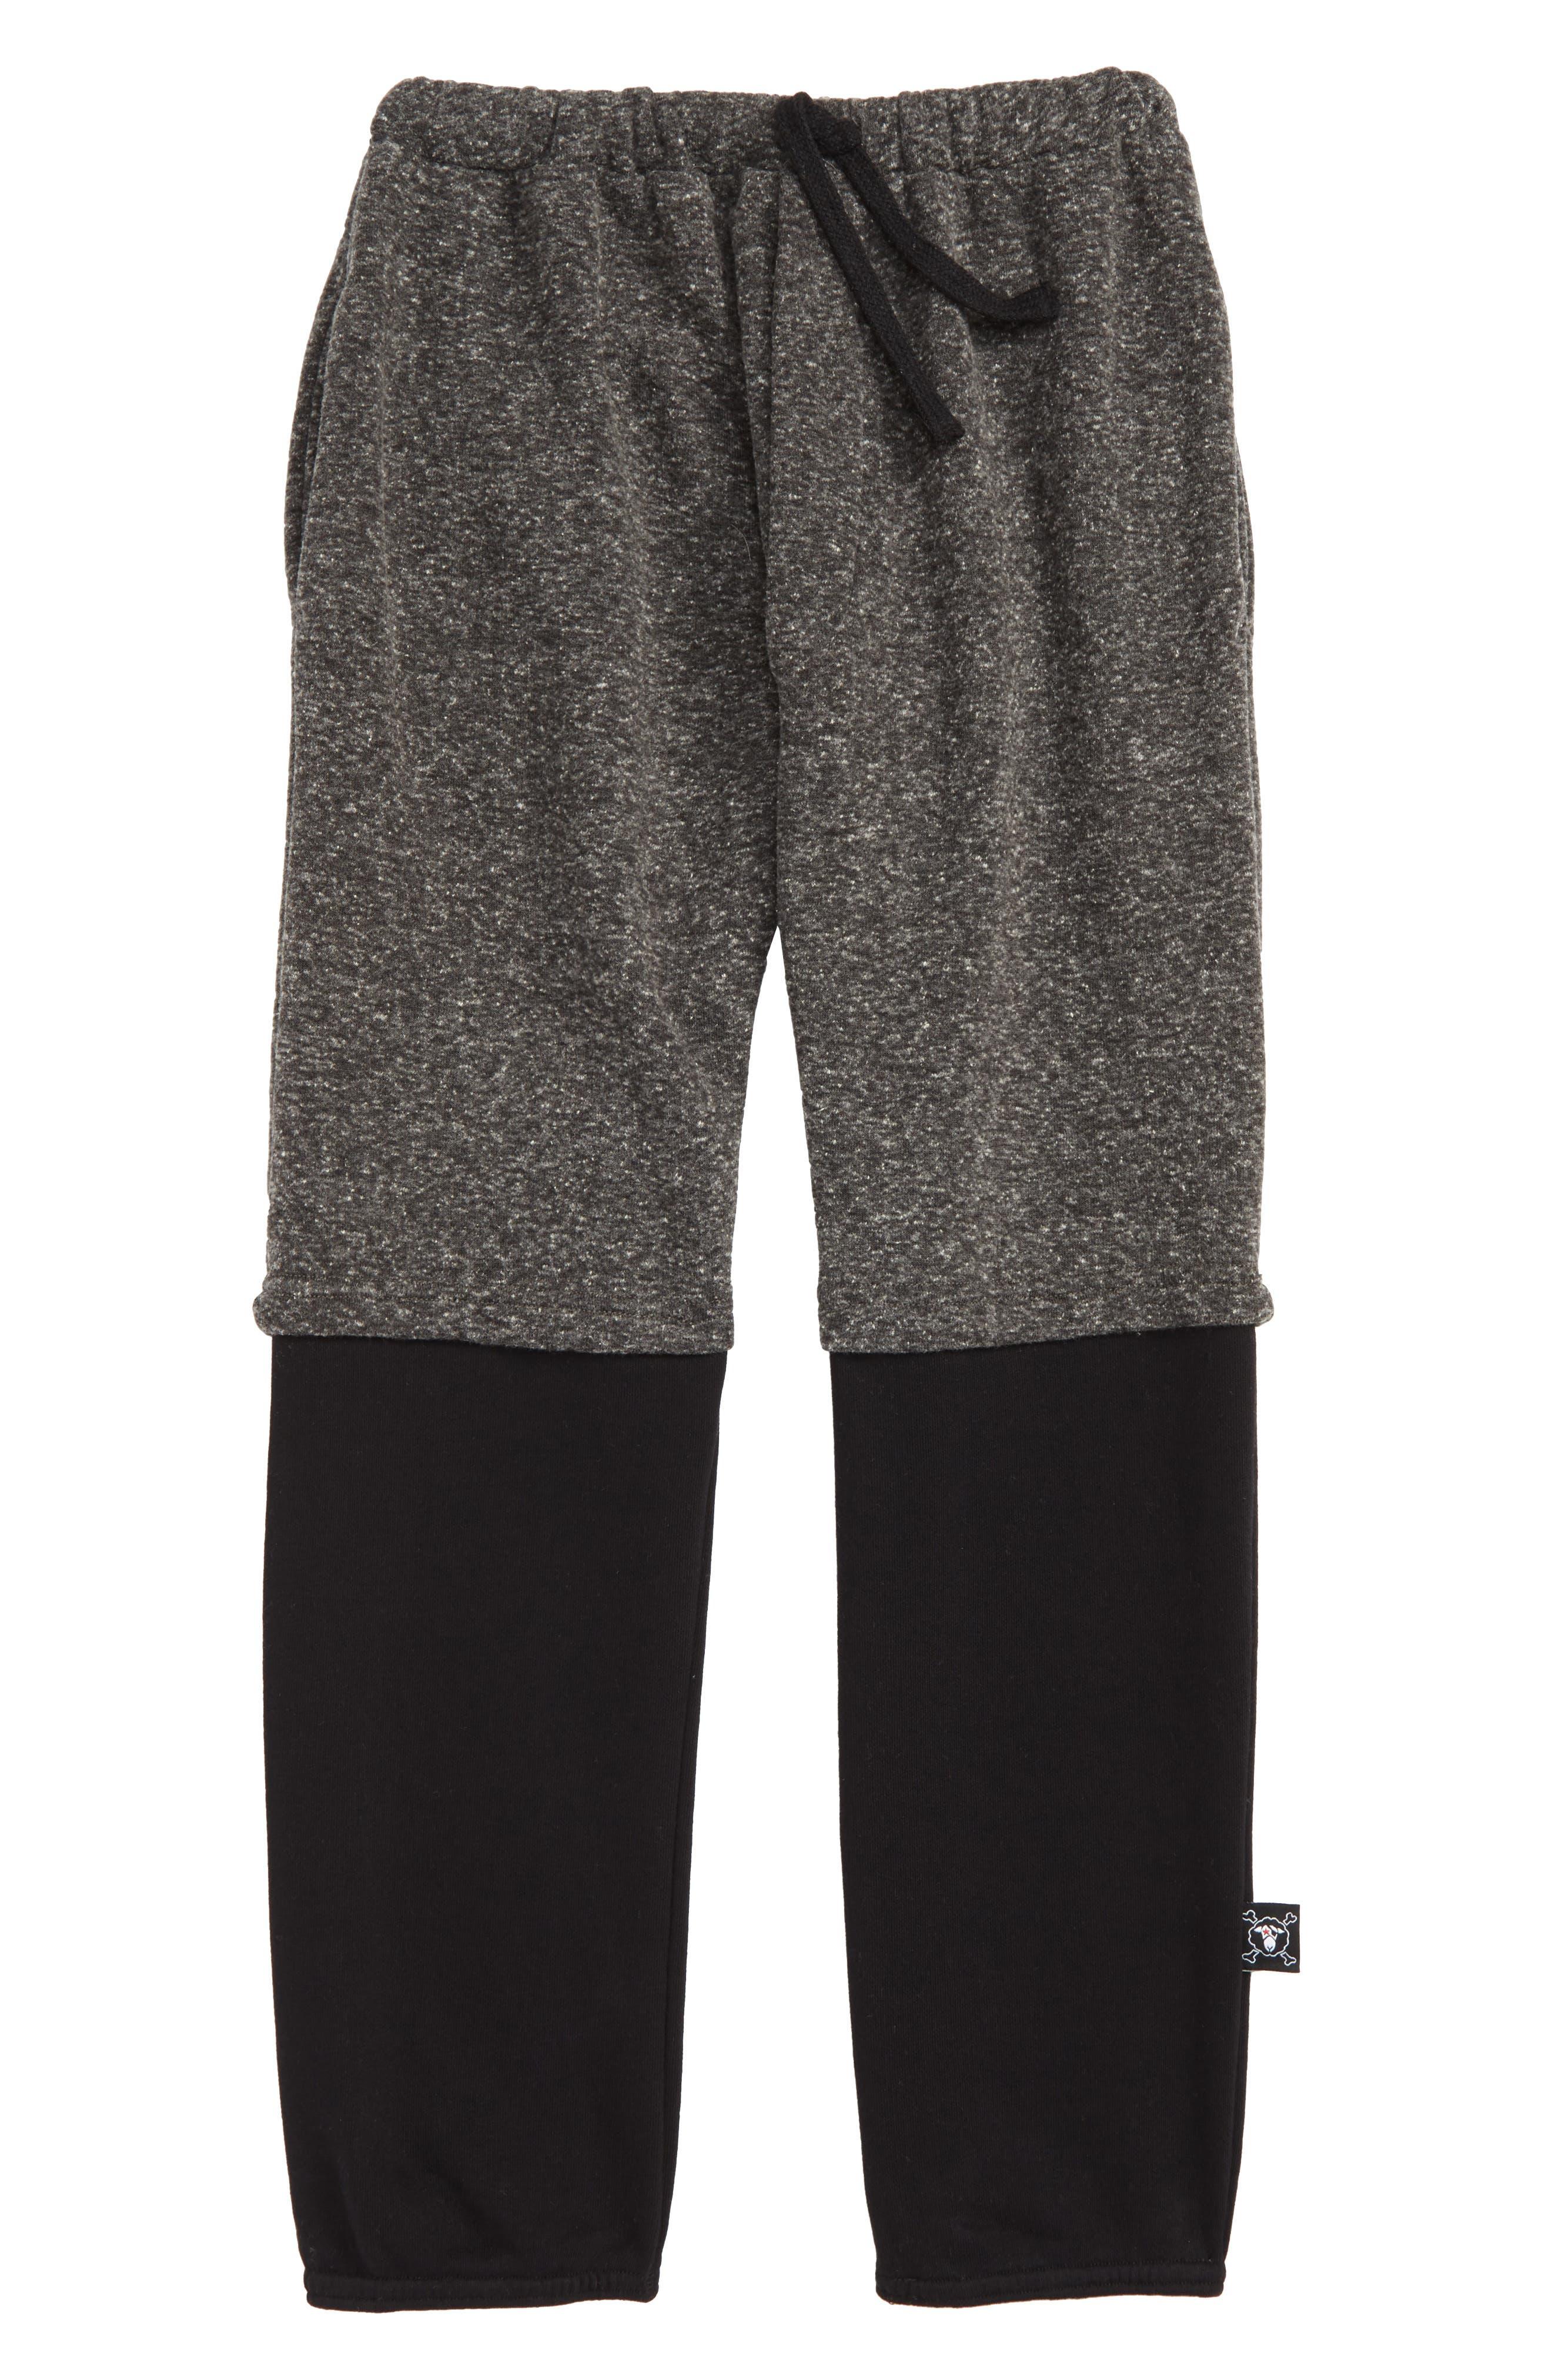 Double Sweatpants,                             Main thumbnail 1, color,                             BLACK/ CHARCOAL